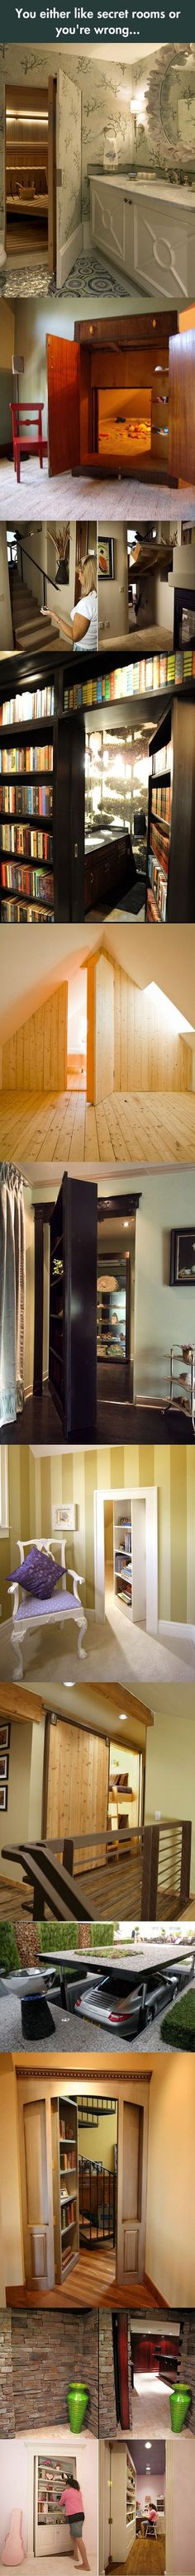 "Install a secret murphy door with bookshelf on ""wine cellar"" turn it into a secret agent hideout..."